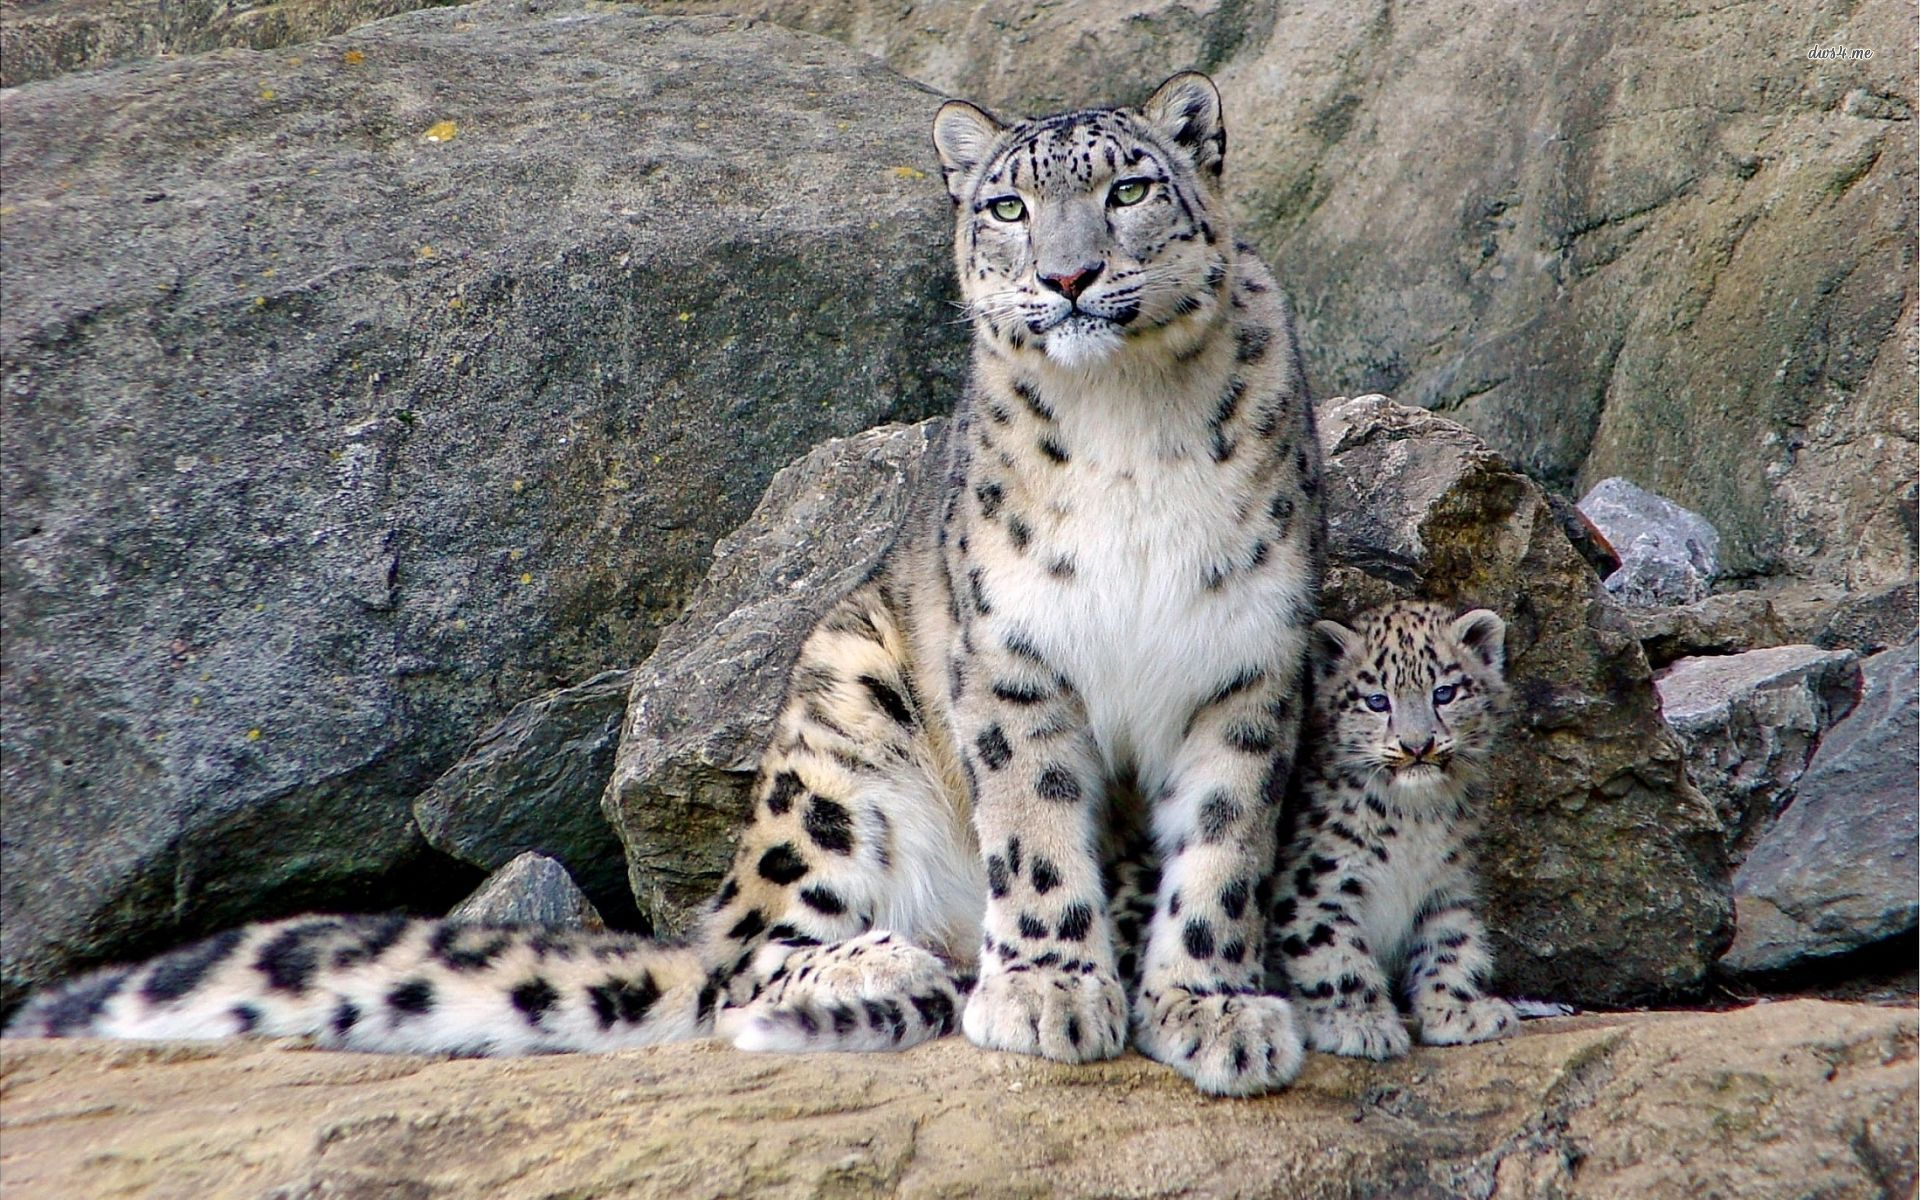 snow leopard with cub animal hd desktop wallpaper leopard wallpaper cub wallpaper animals no